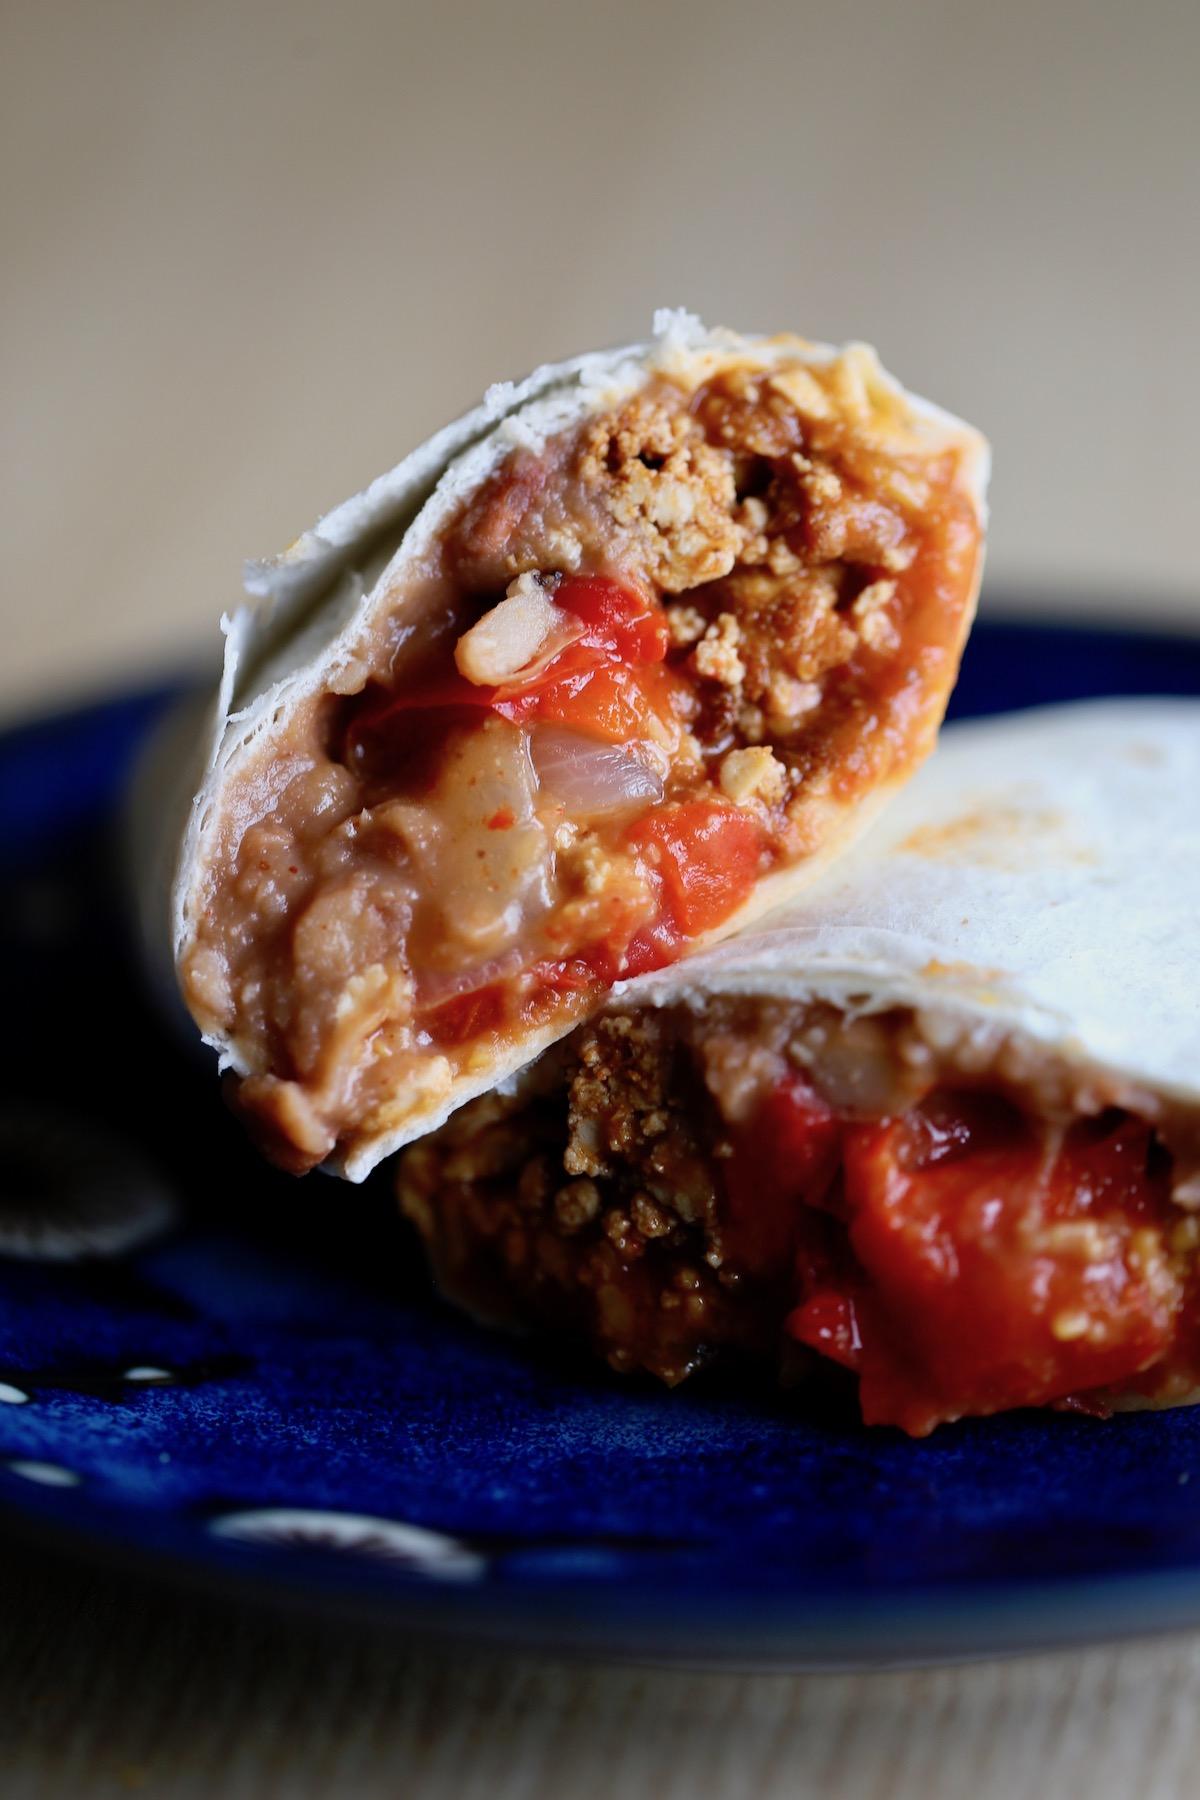 A vegan breakfast burrito cut in half on a plate